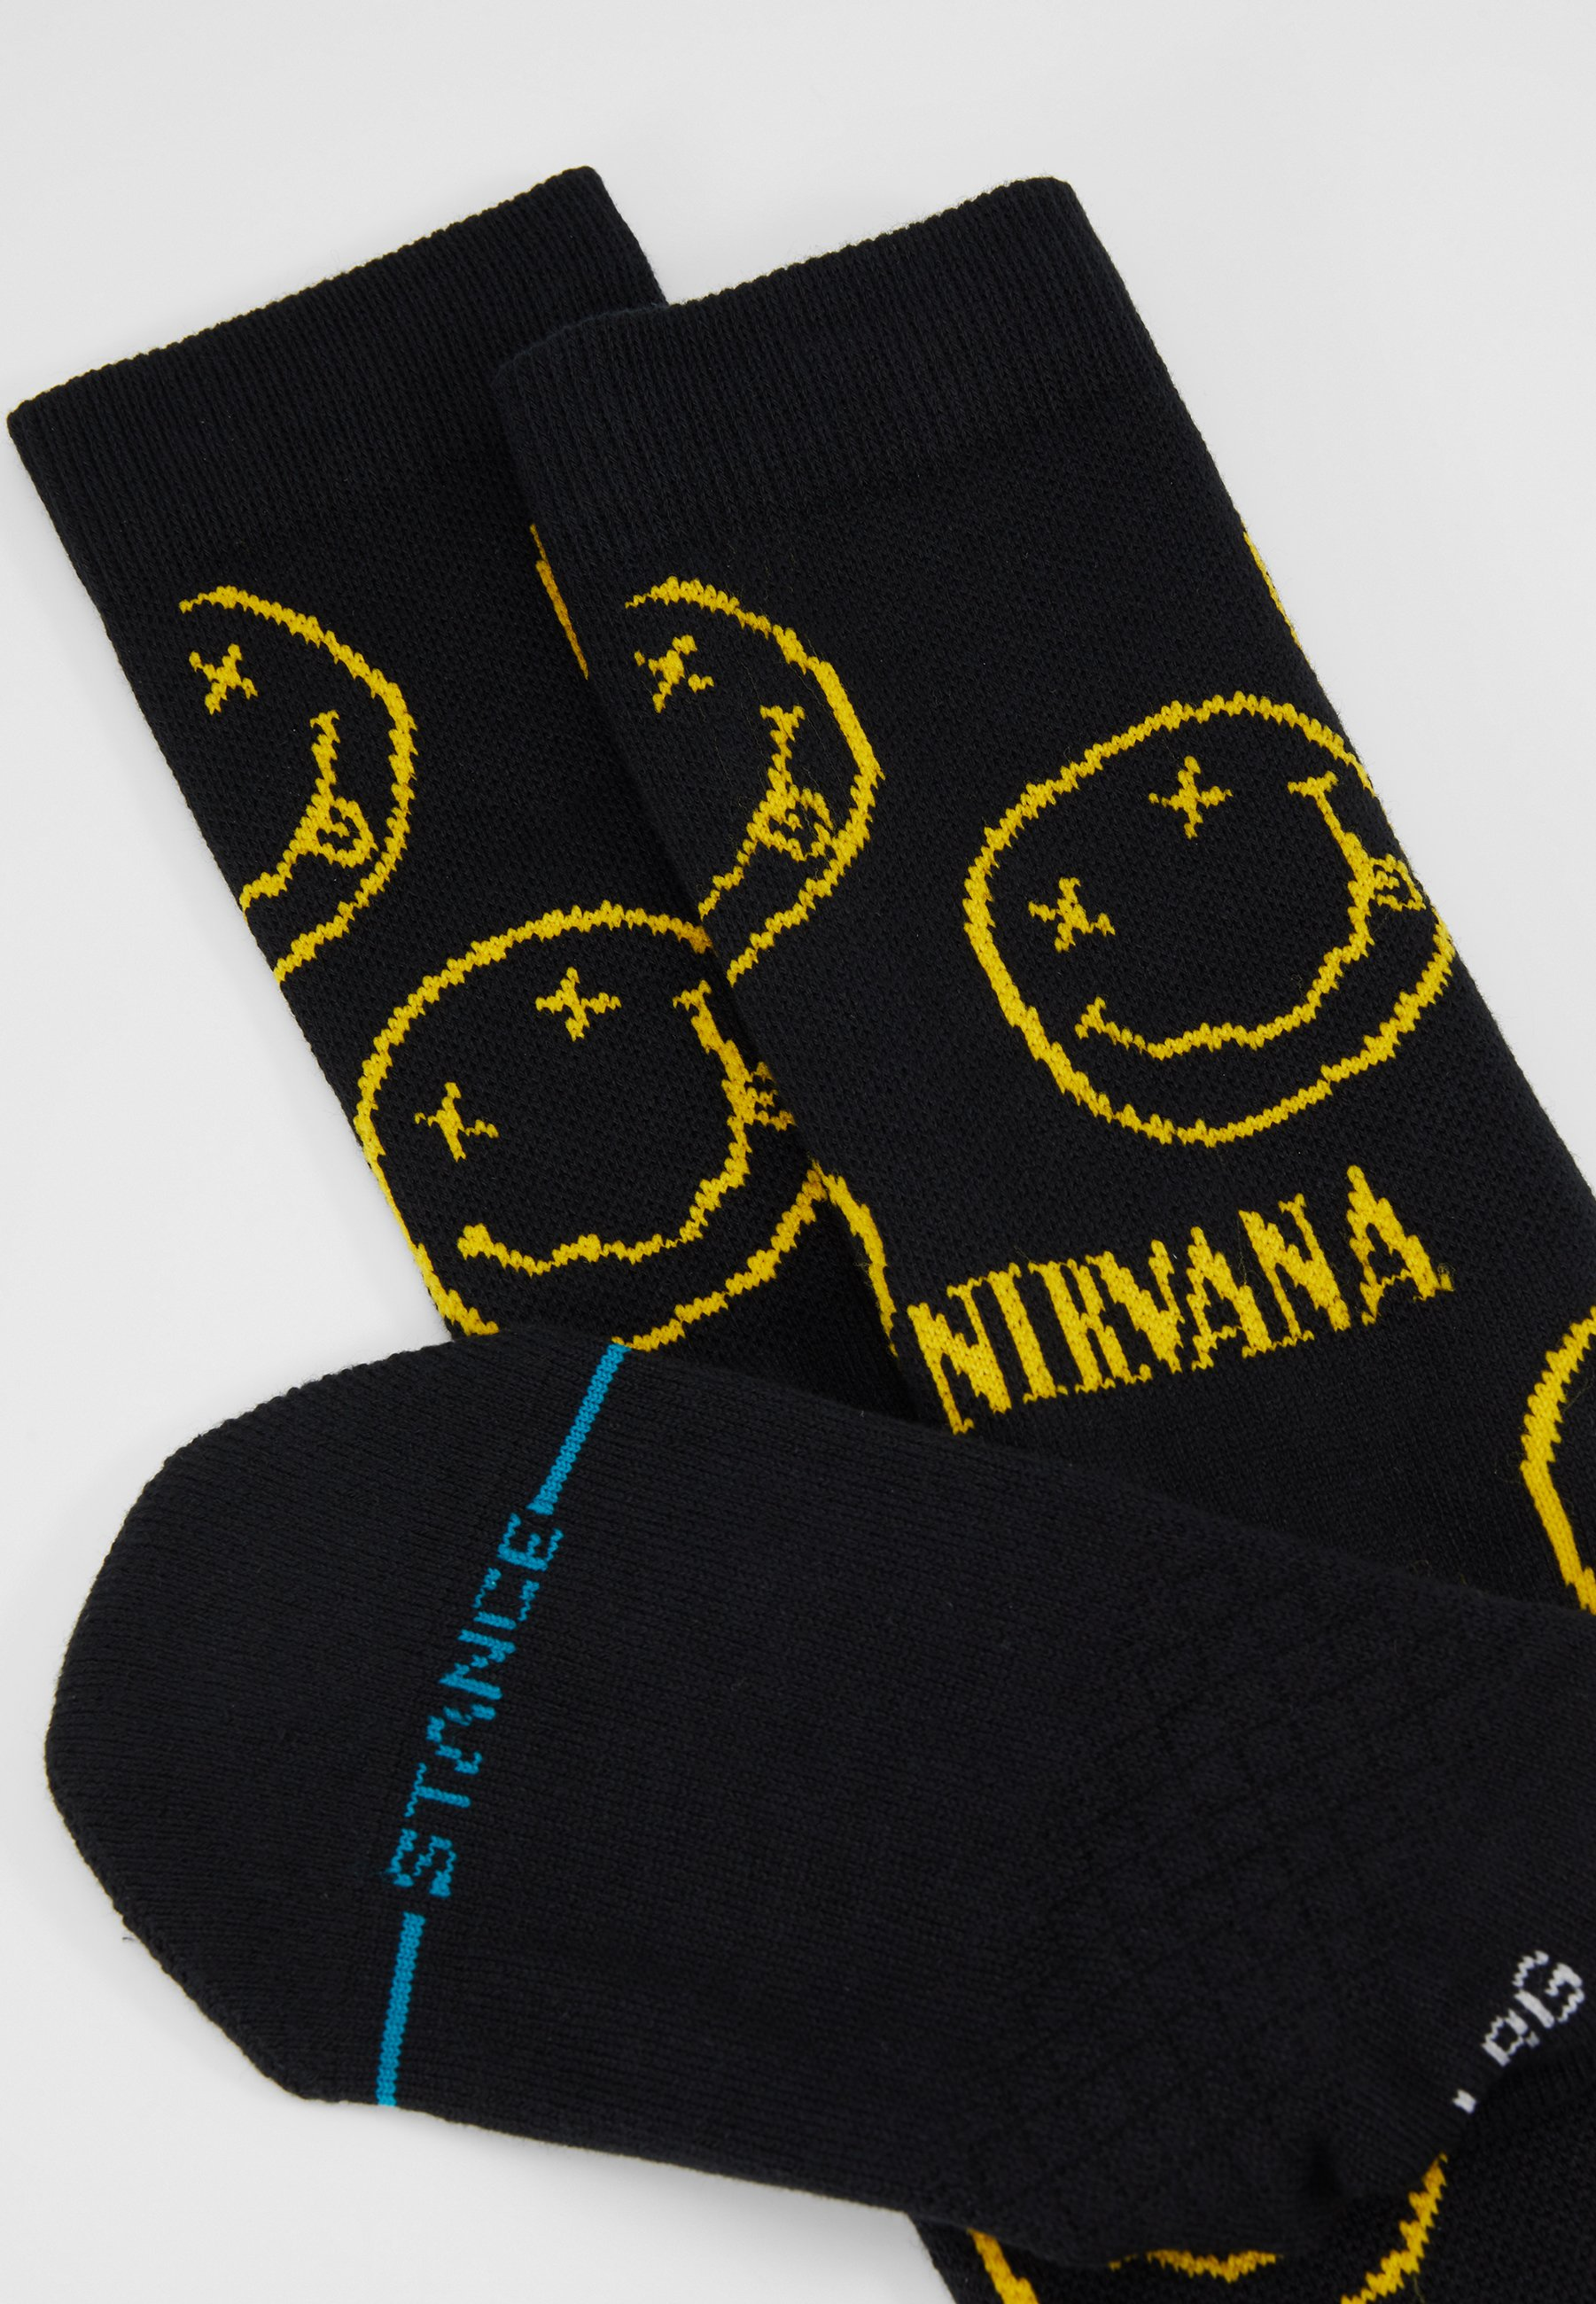 Stance Nirvana Visage Ras Skate Chaussettes